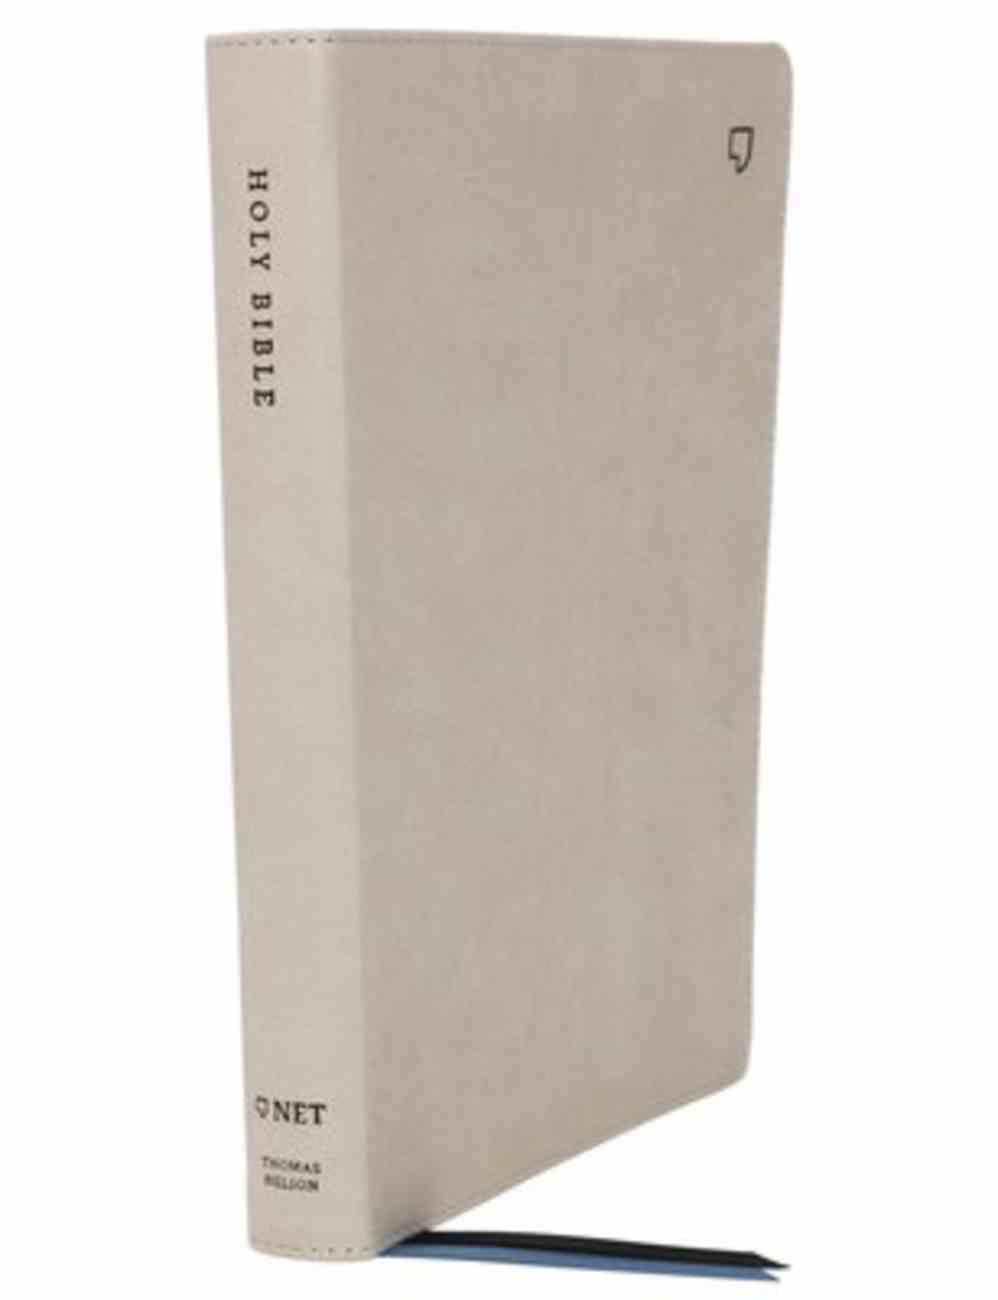 NET Bible Thinline Large Print Stone Premium Imitation Leather